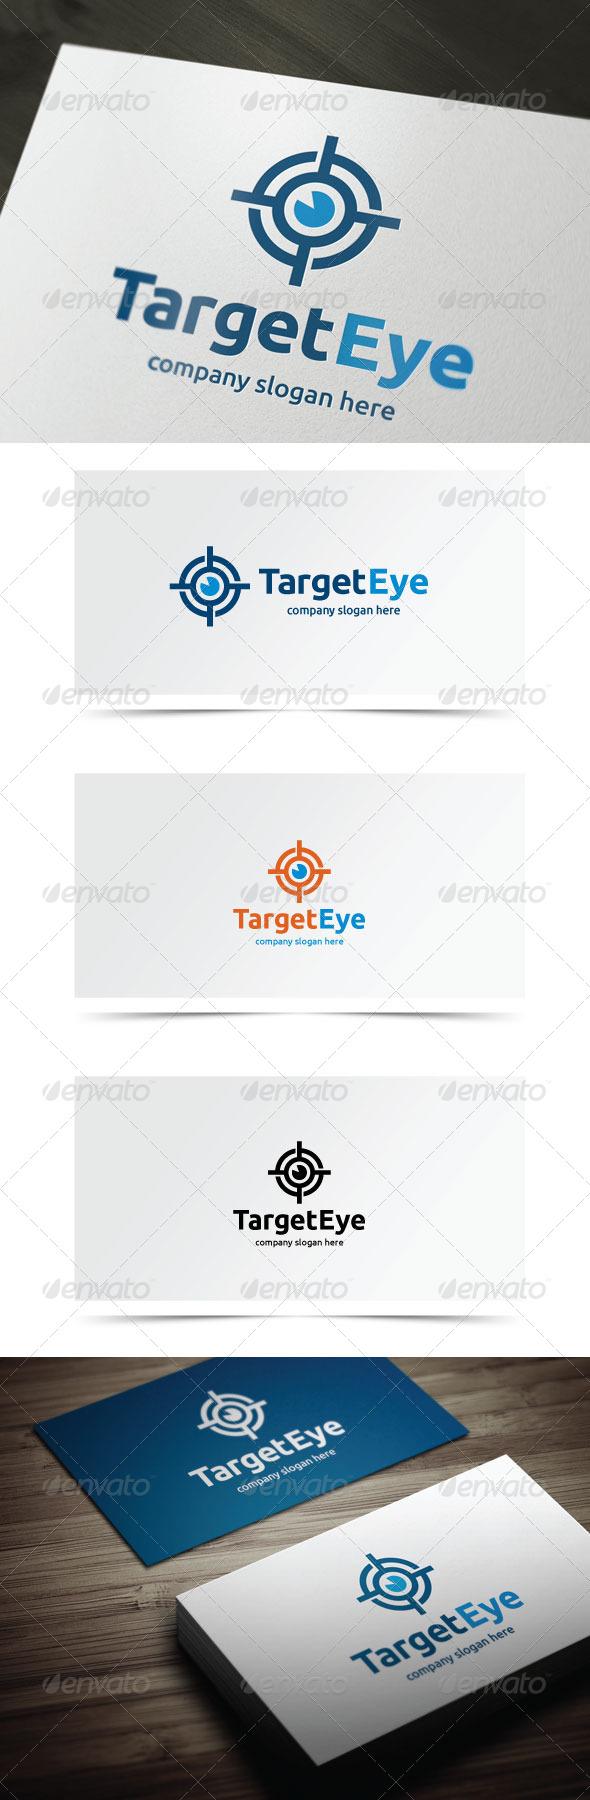 GraphicRiver Target Eye 6906044